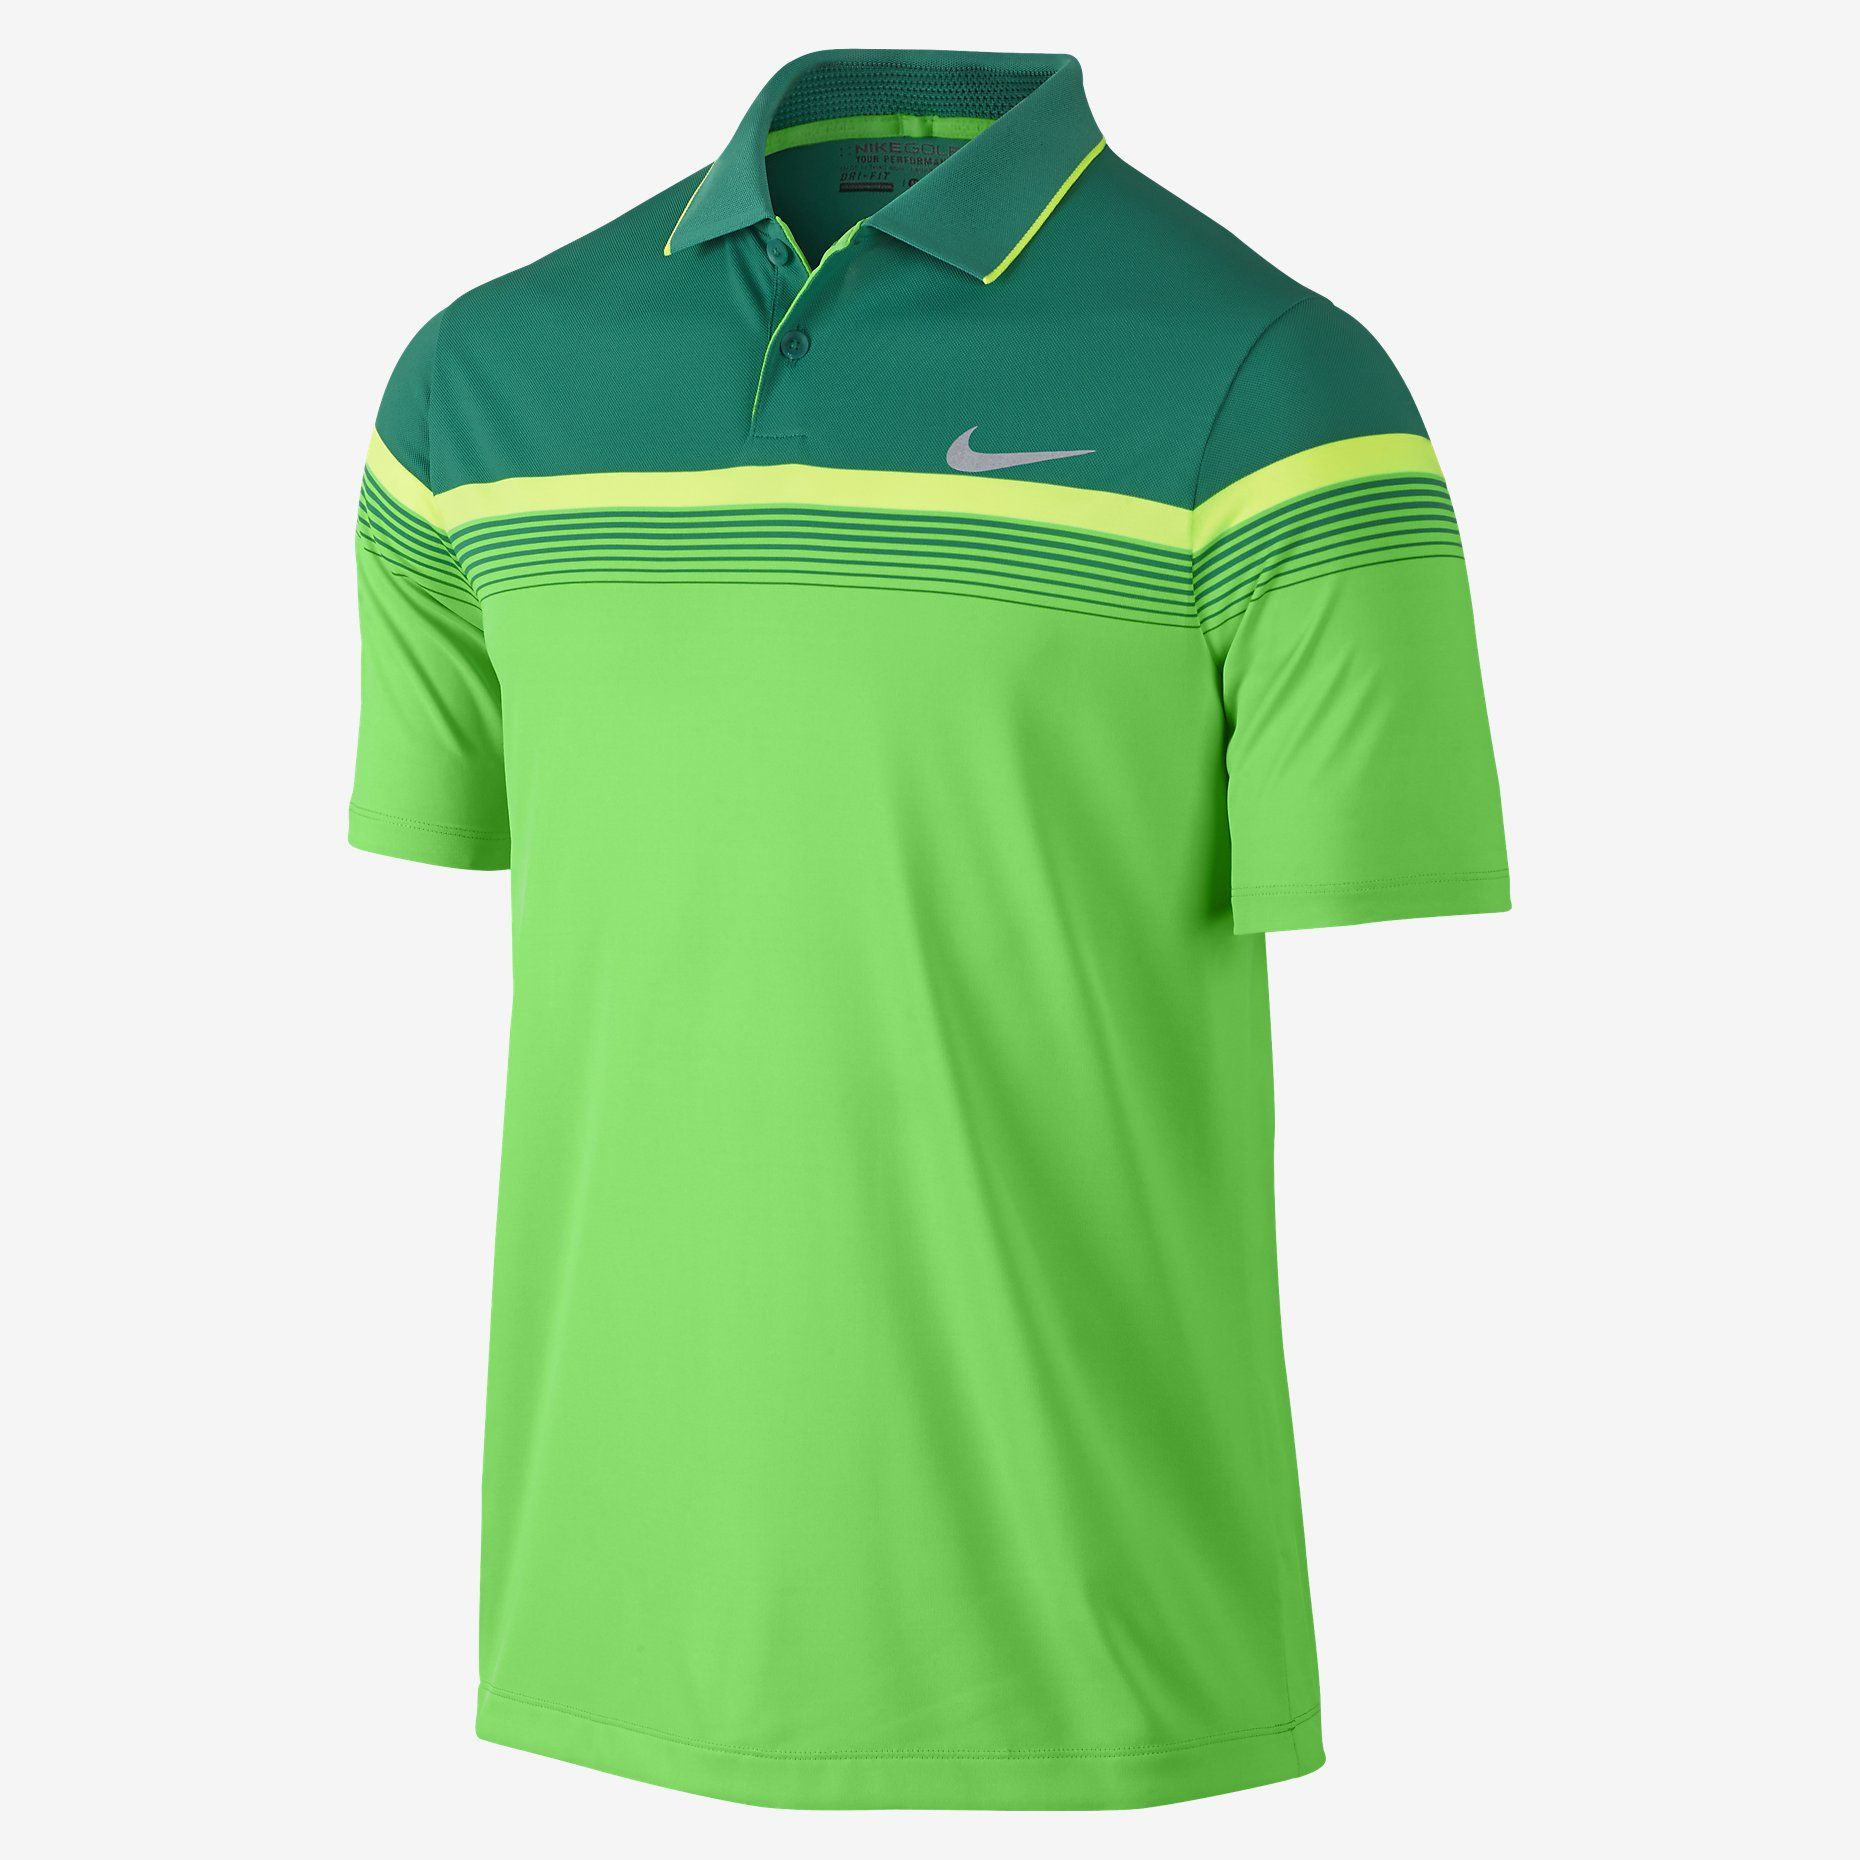 hardware Respeto a ti mismo ensayo  Nike Modern Major Moment Men's Golf Polo Shirt. Nike Store UK | Gym wear  men, Polo, Gym men